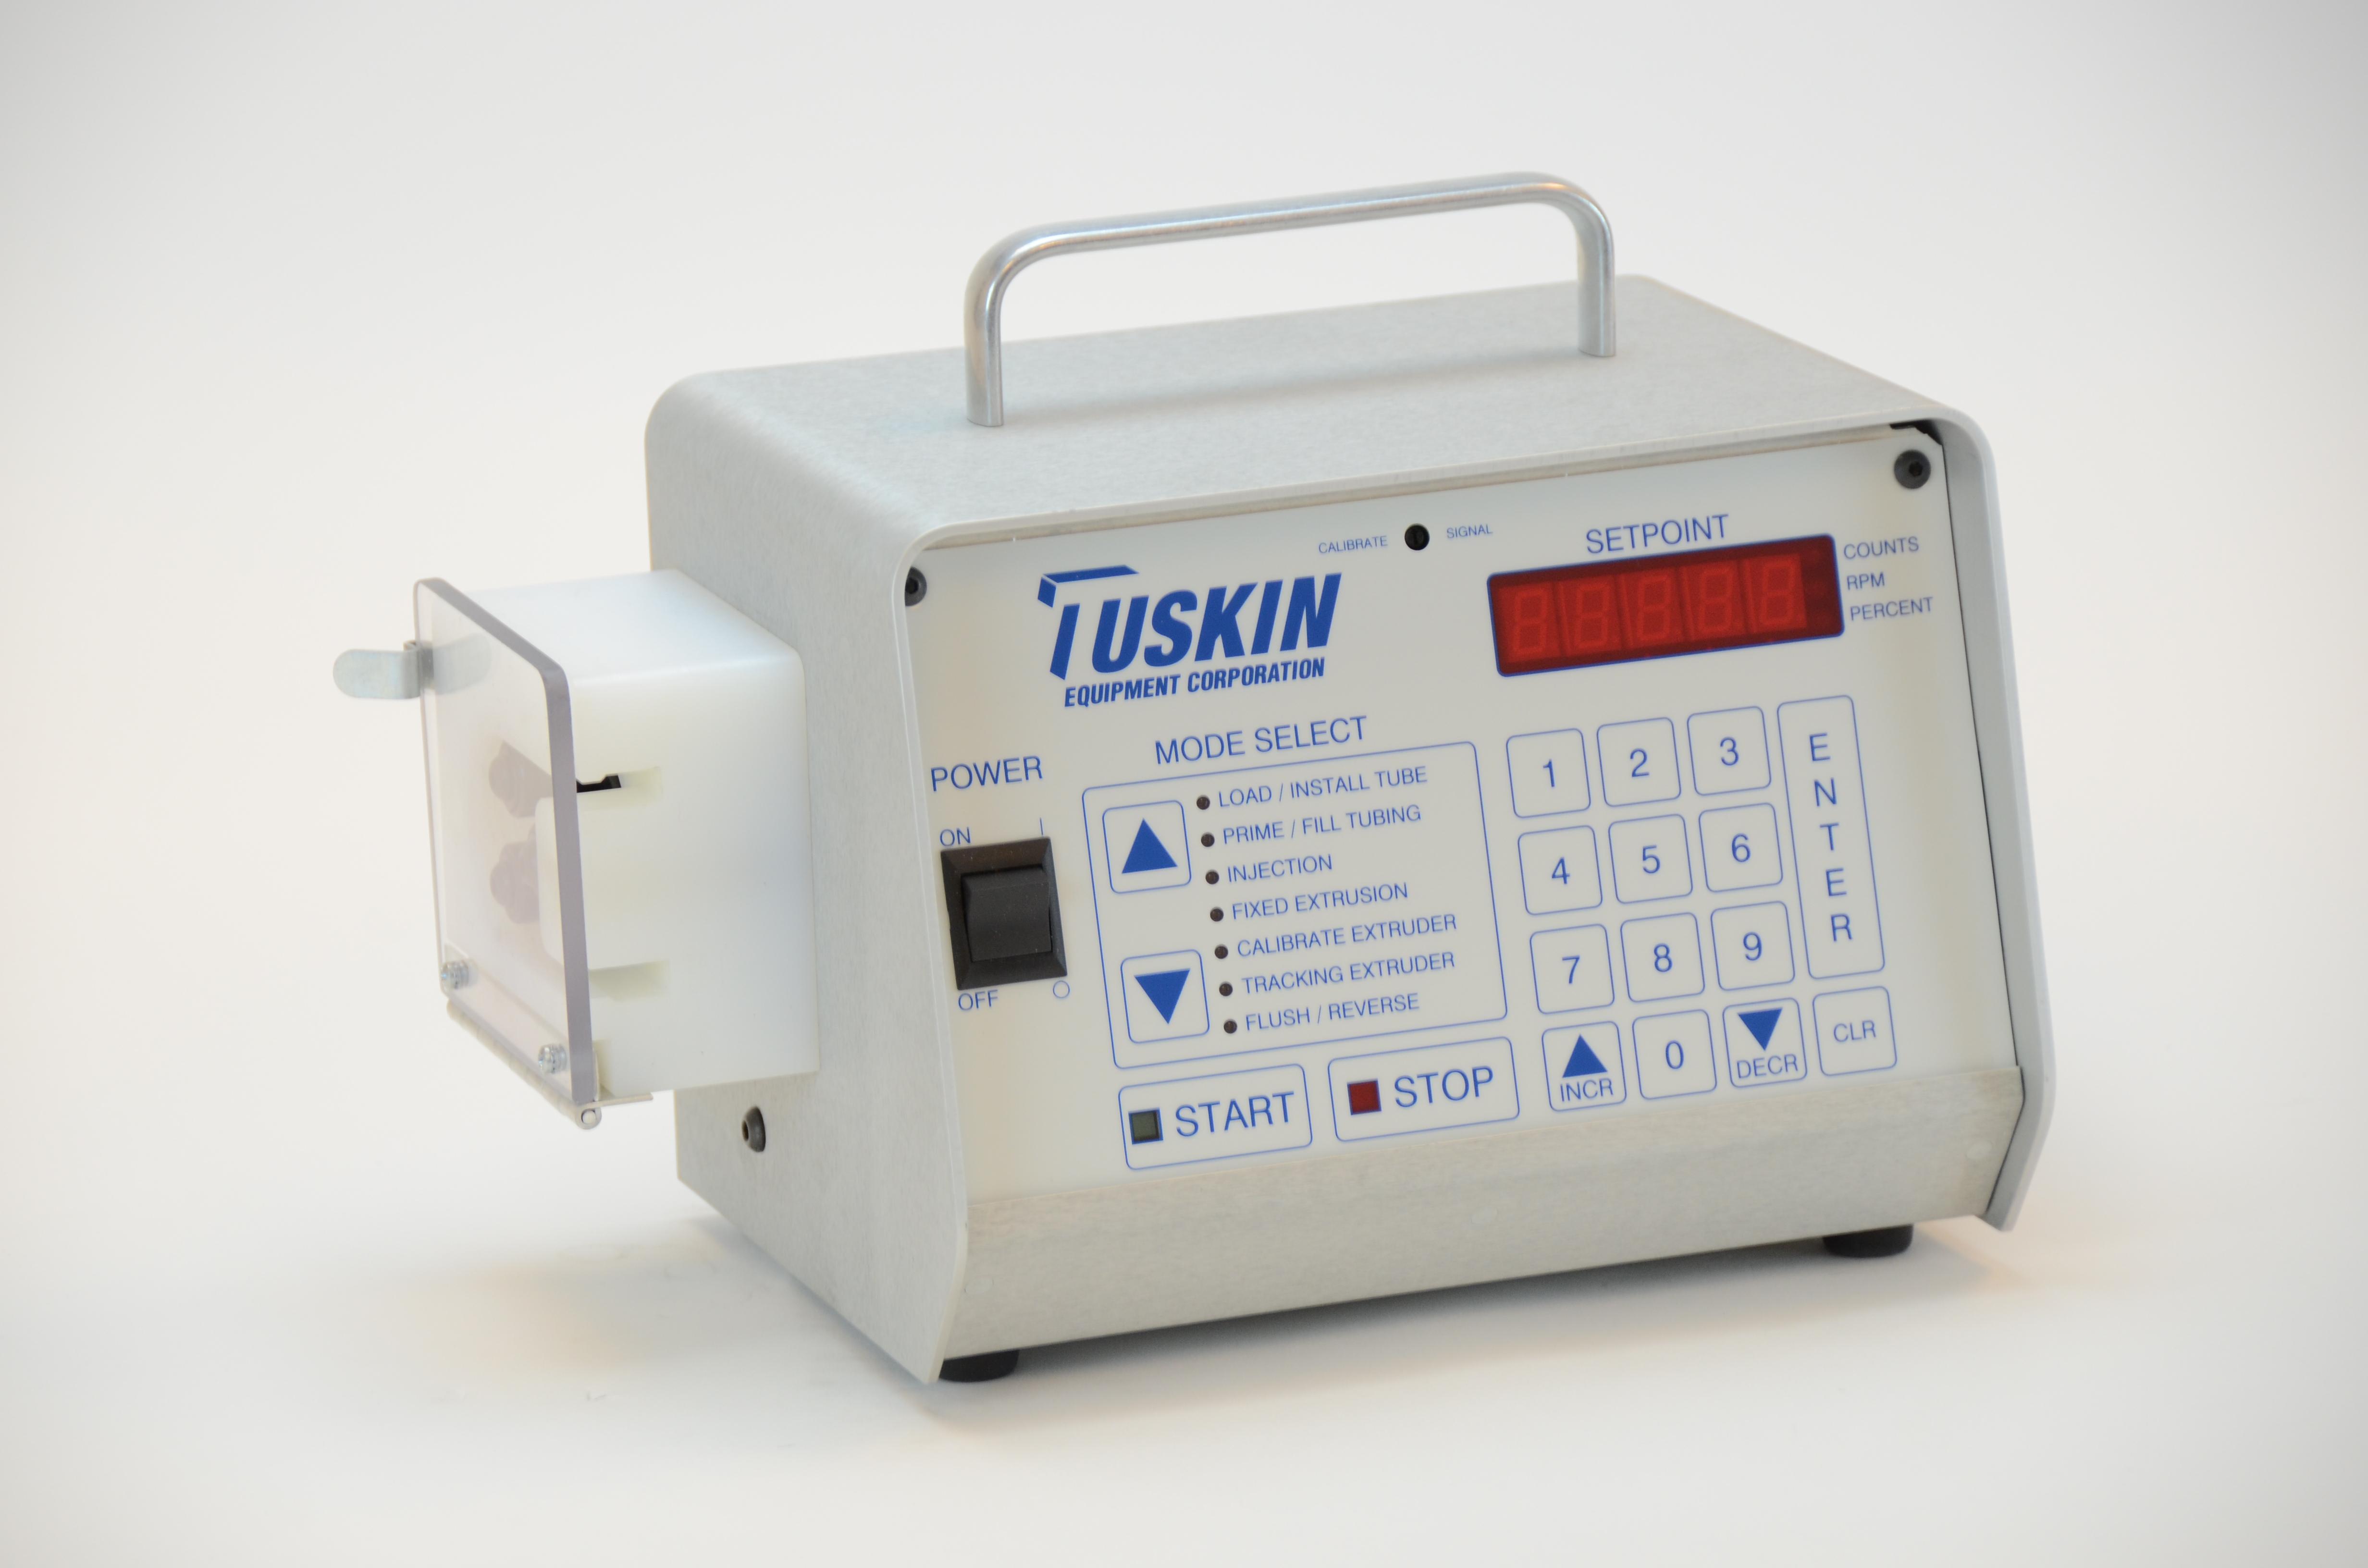 Tuskin liquid color pumps include 050 Series 3-roller pump head